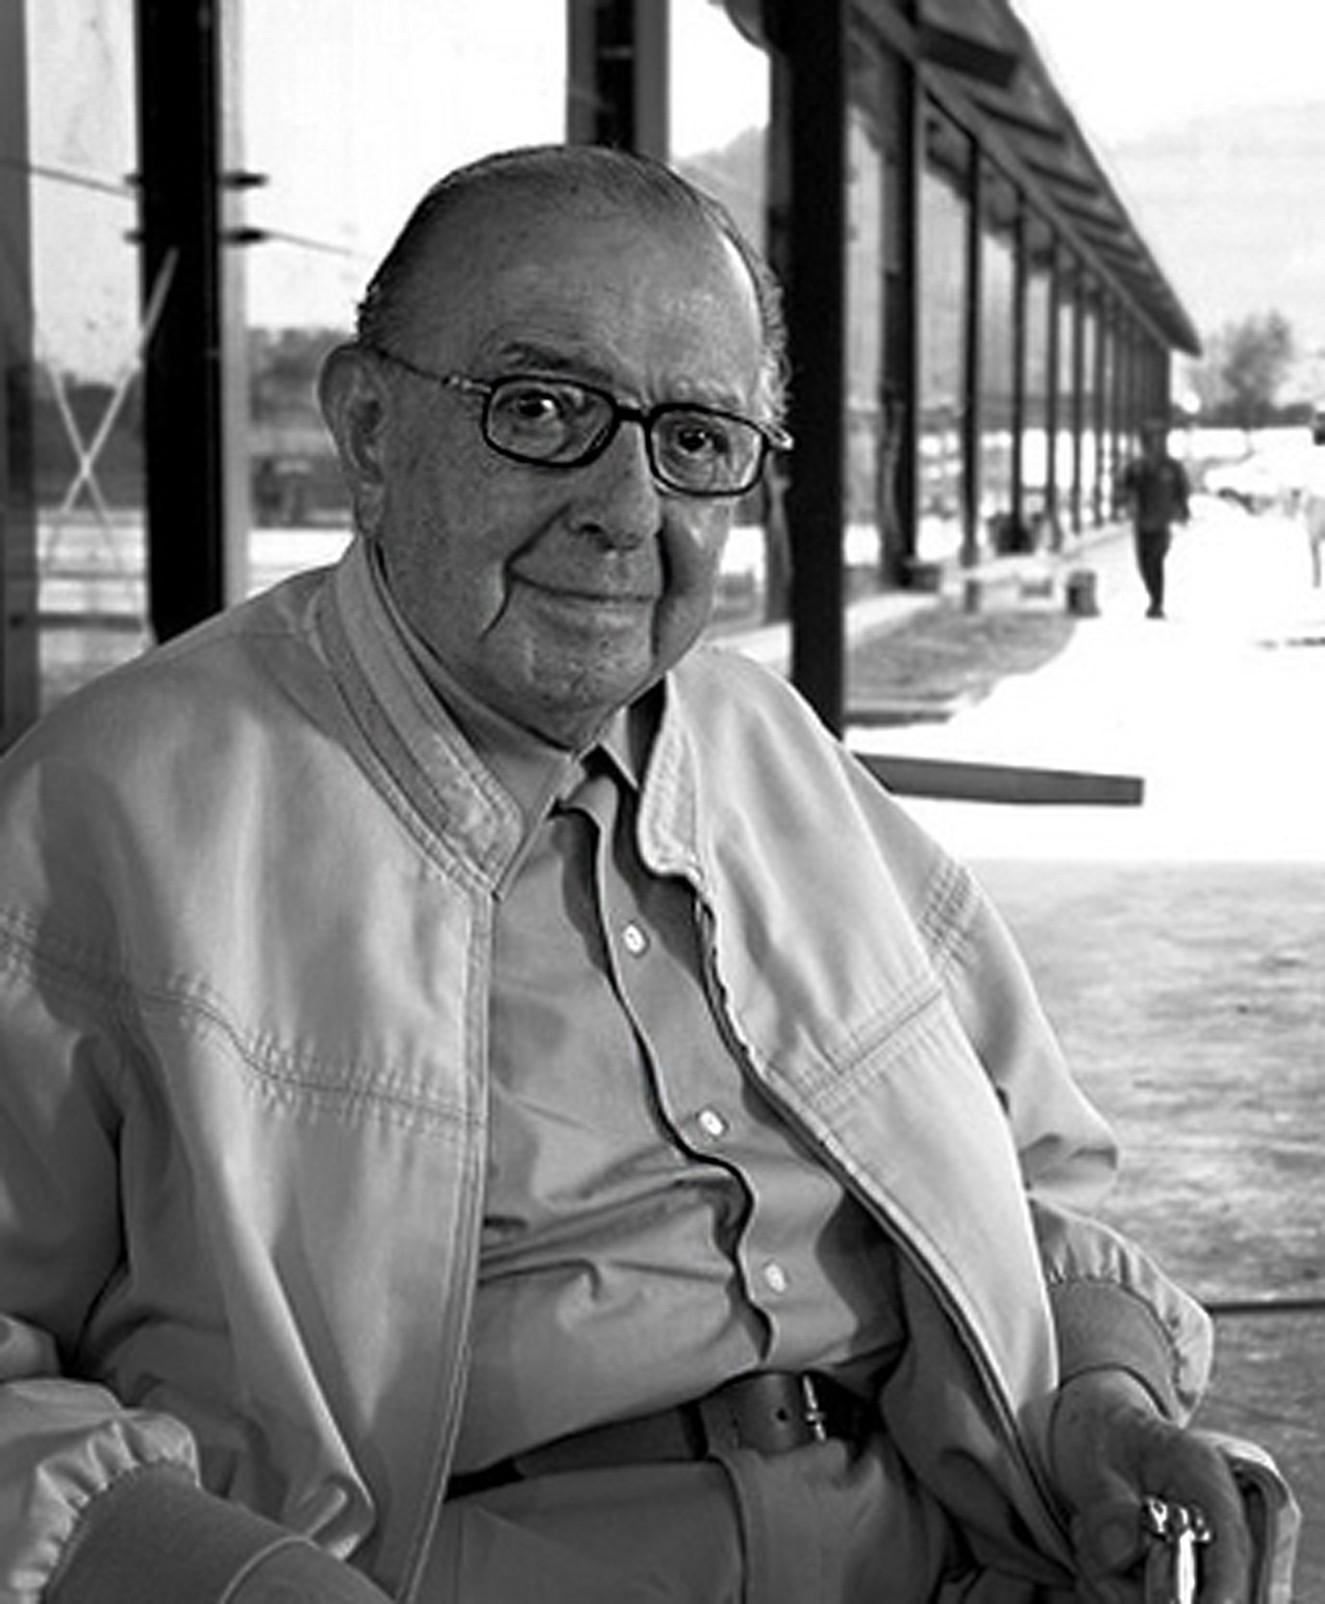 En perspectiva pedro ram rez v zquez archdaily m xico - Pedro piqueras biografia ...